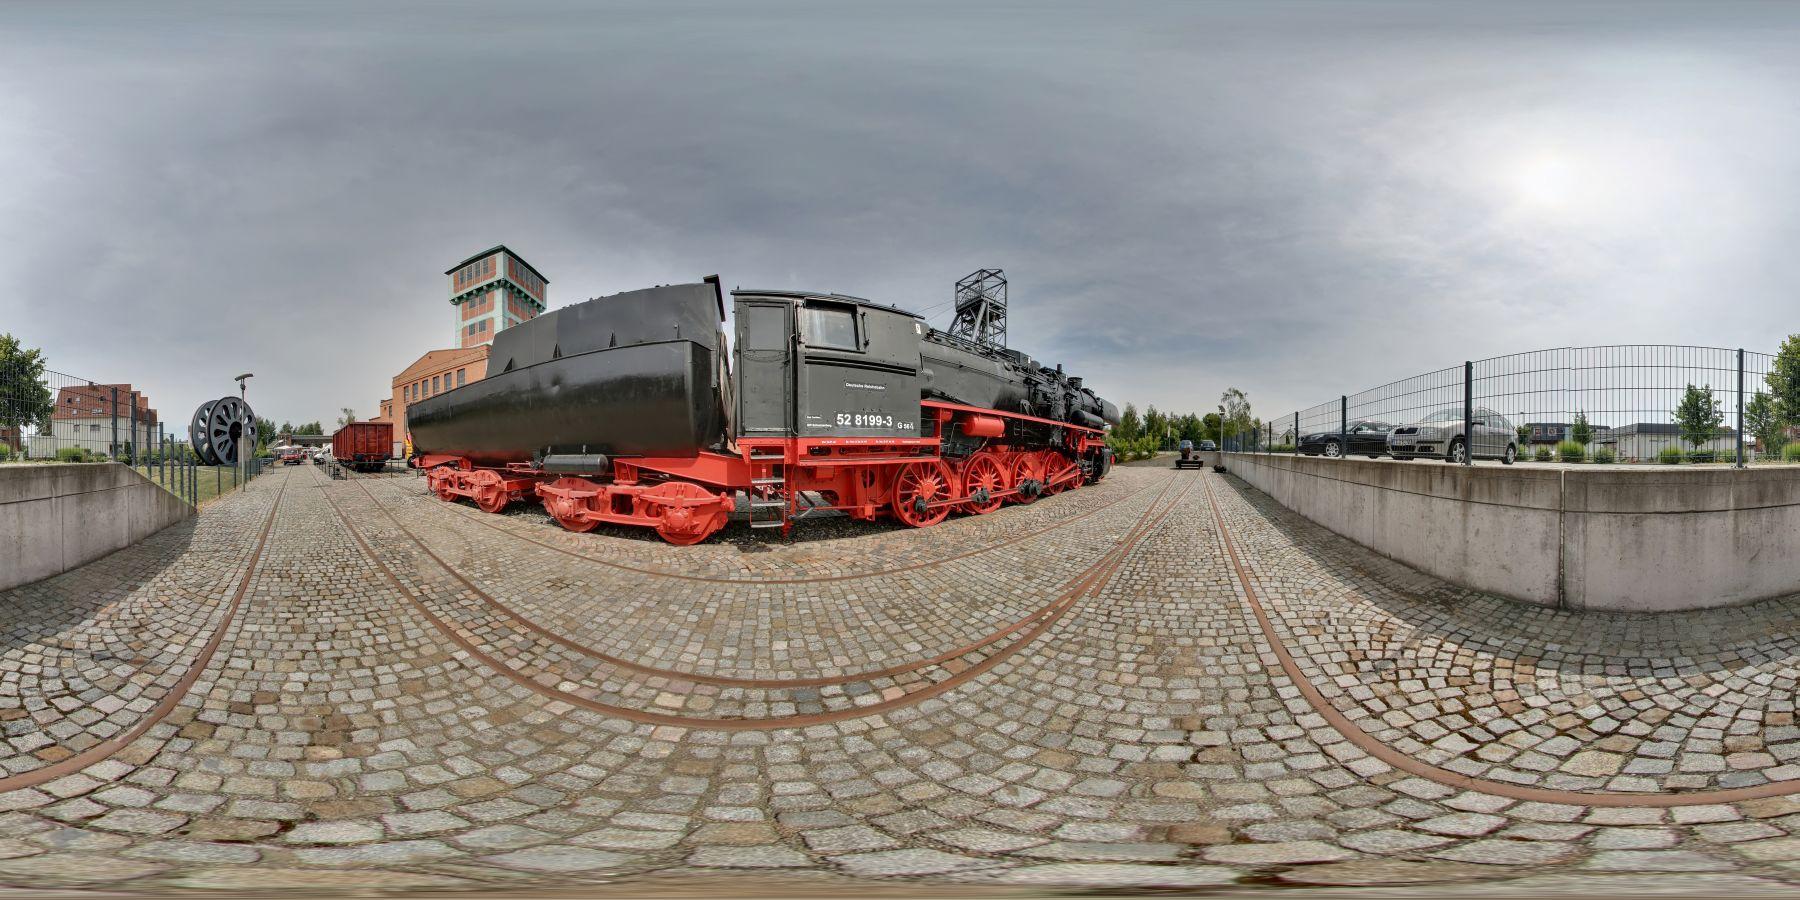 Oelsnitz_Bergbaumuseumhof3_equi - Panoramen Übersicht